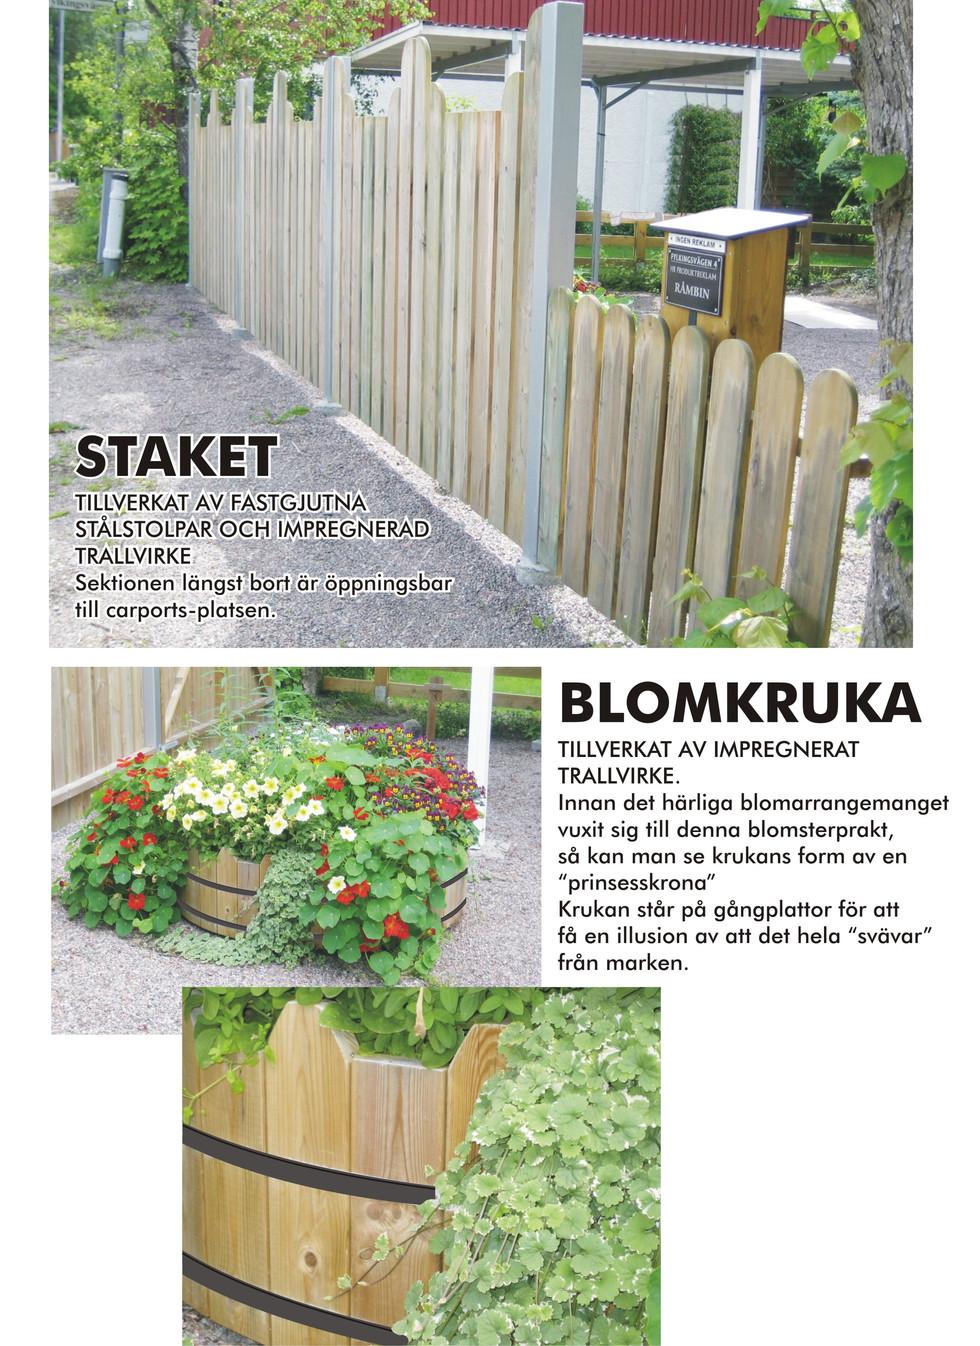 SNICK Staket & Blomkruka.jpg